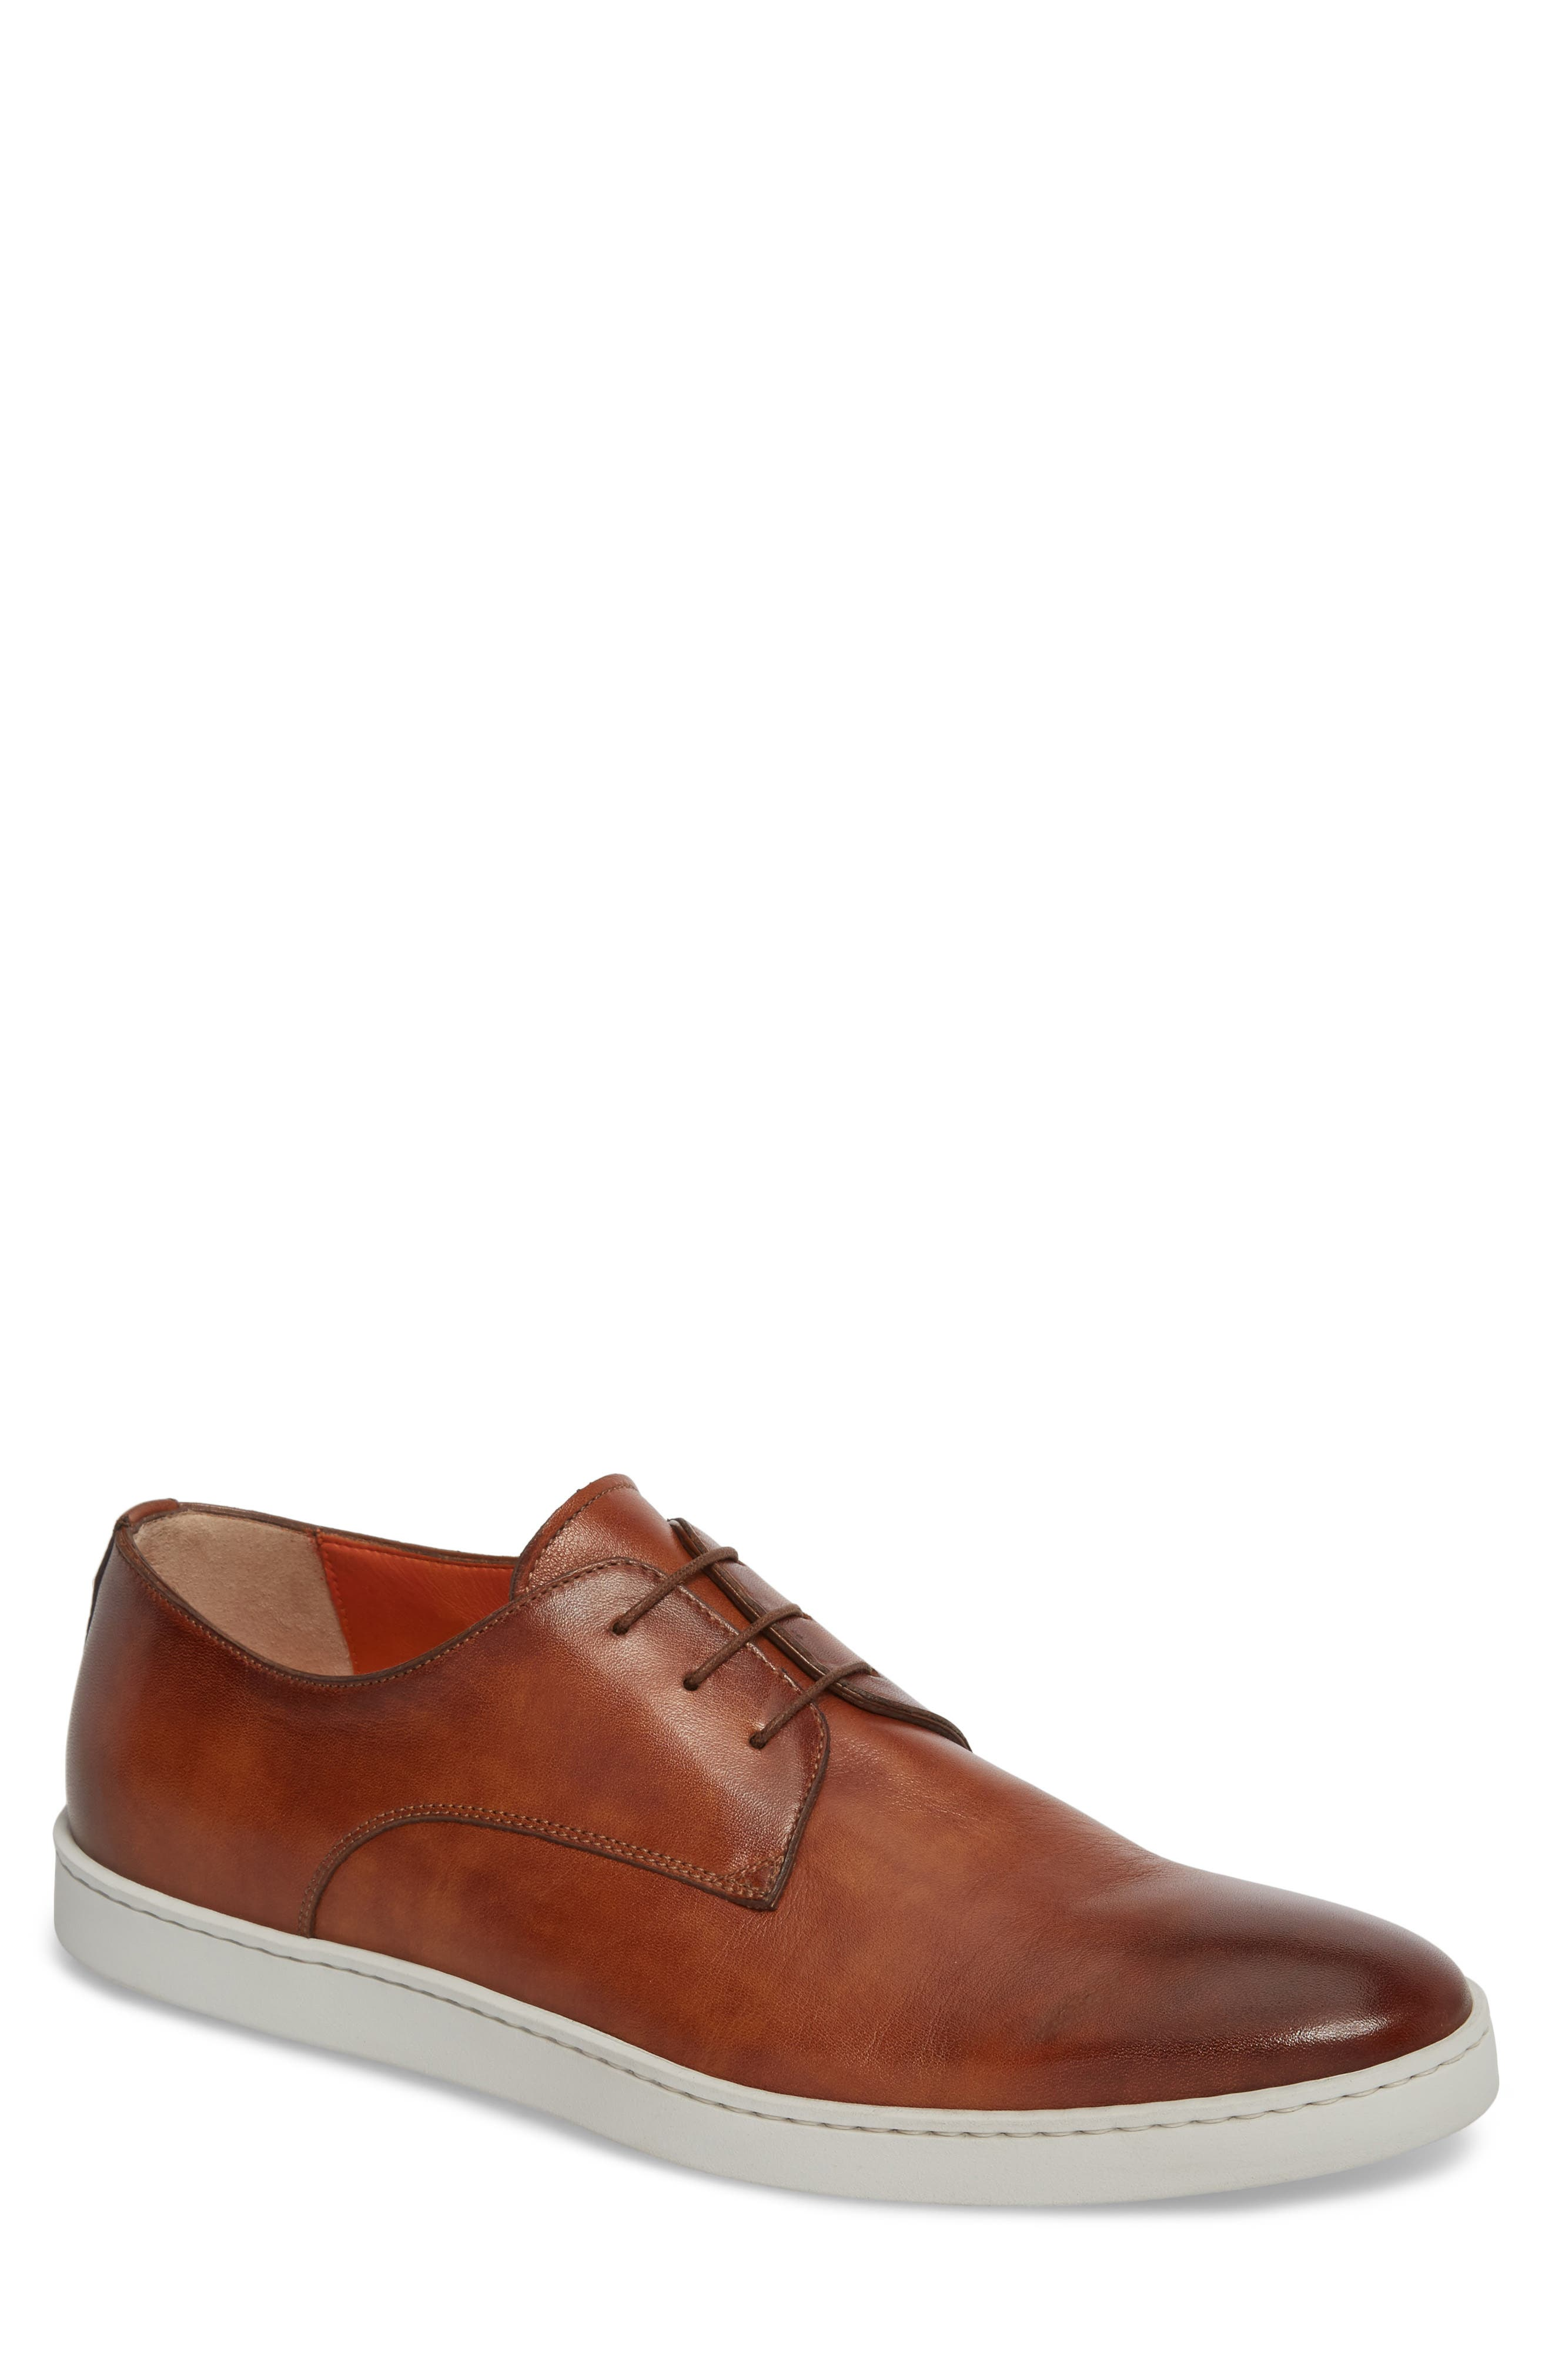 Doyle Plain Toe Derby Sneaker,                             Main thumbnail 1, color,                             TAN